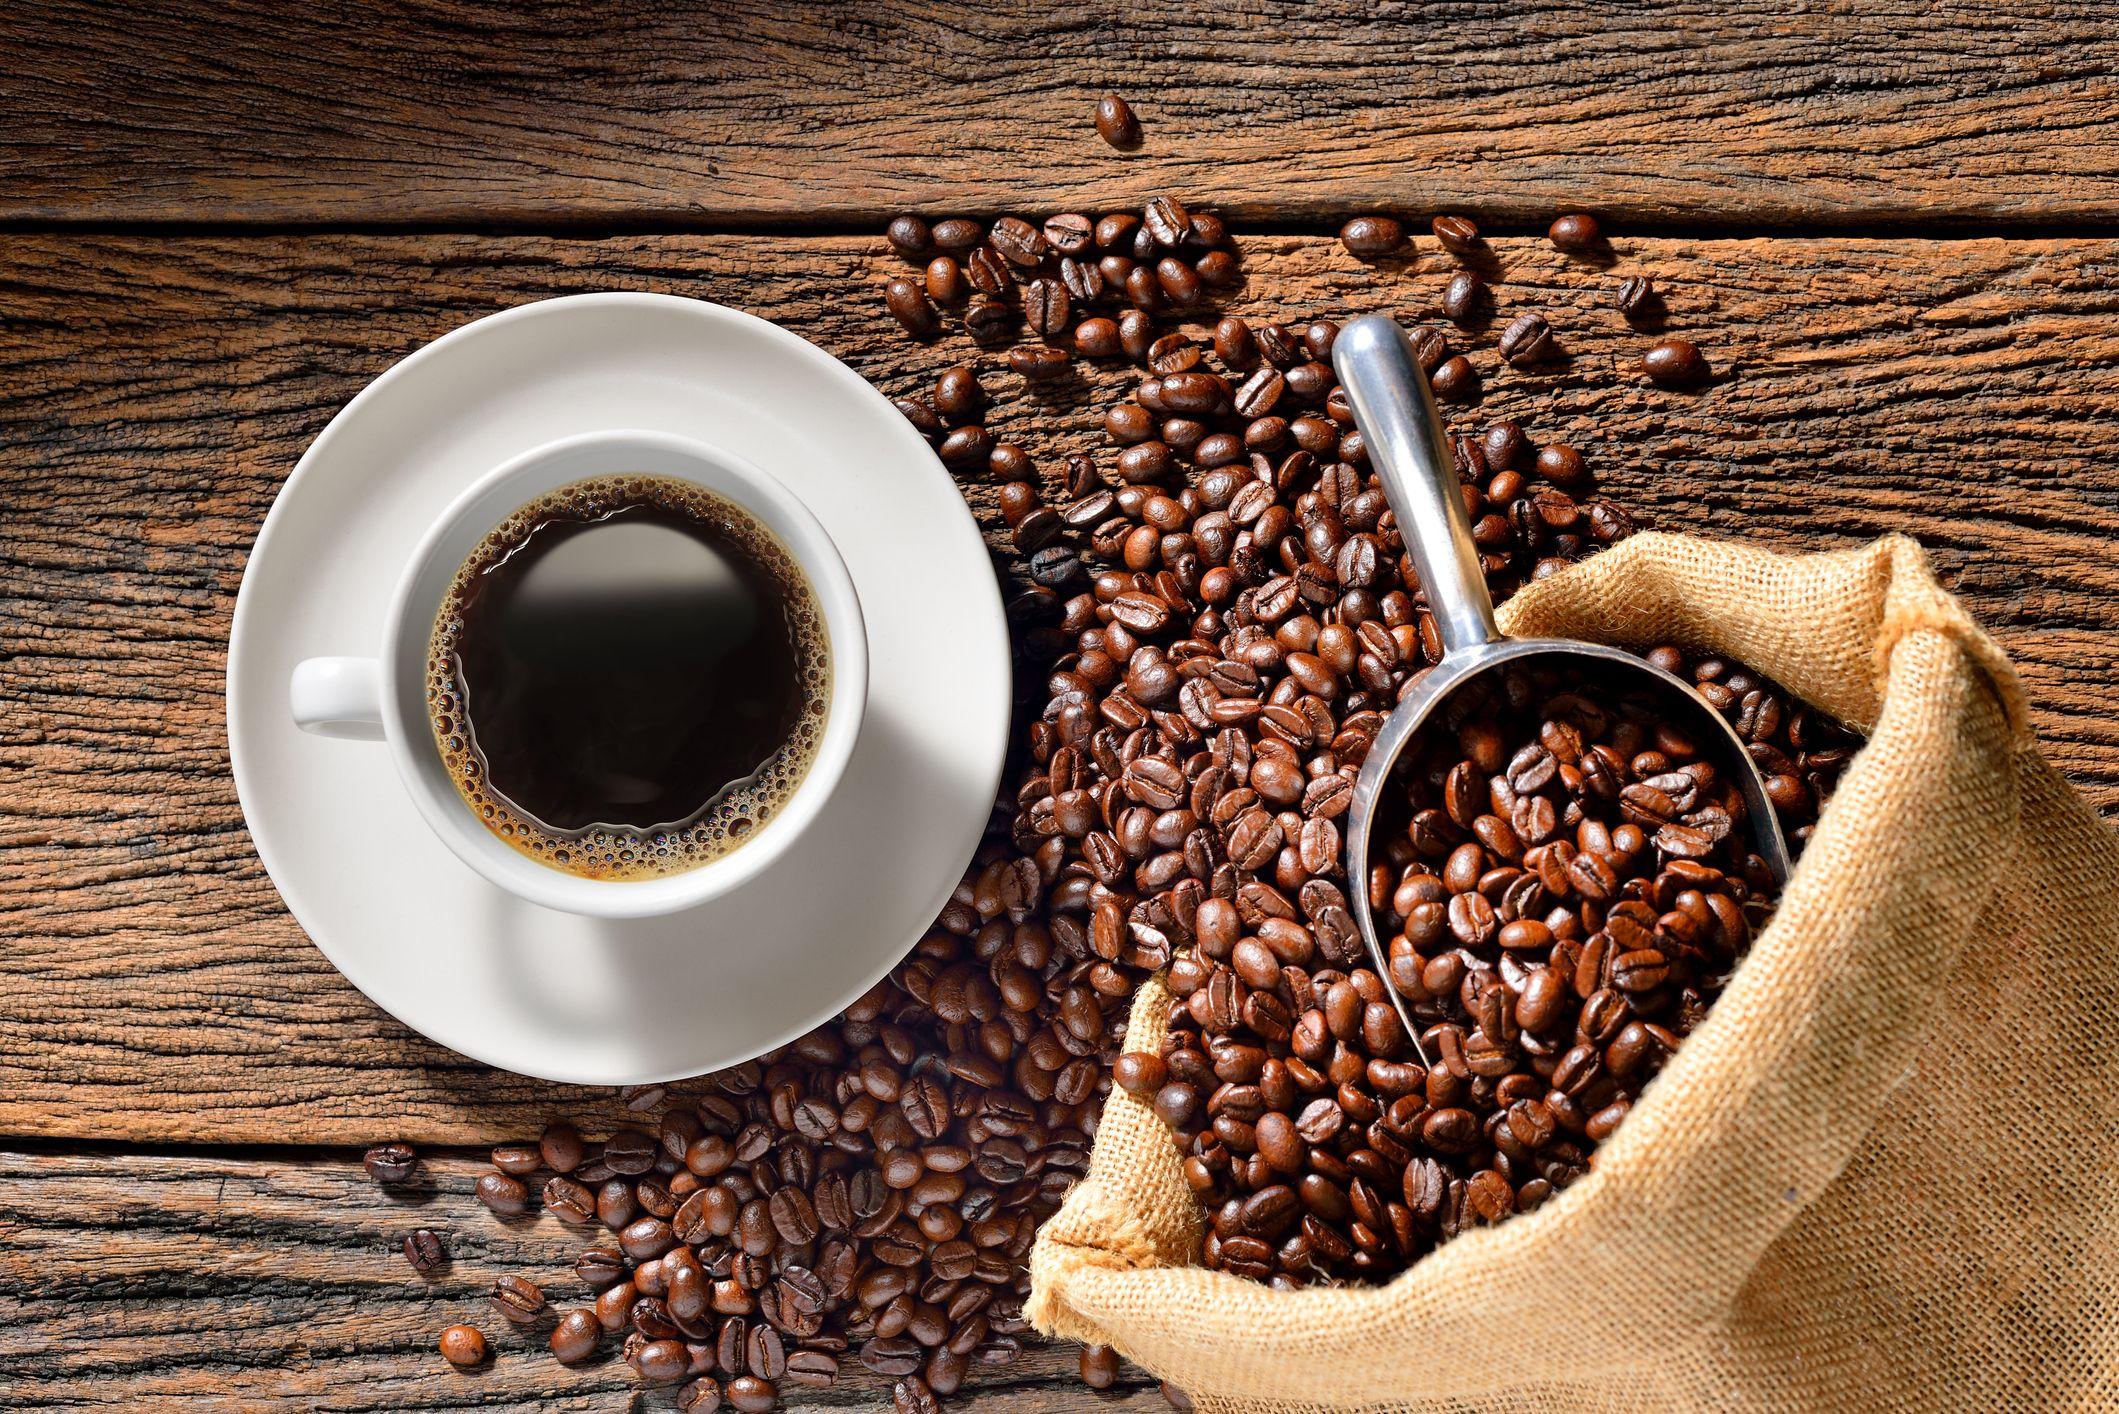 تهیه قهوه با قهوه جوش